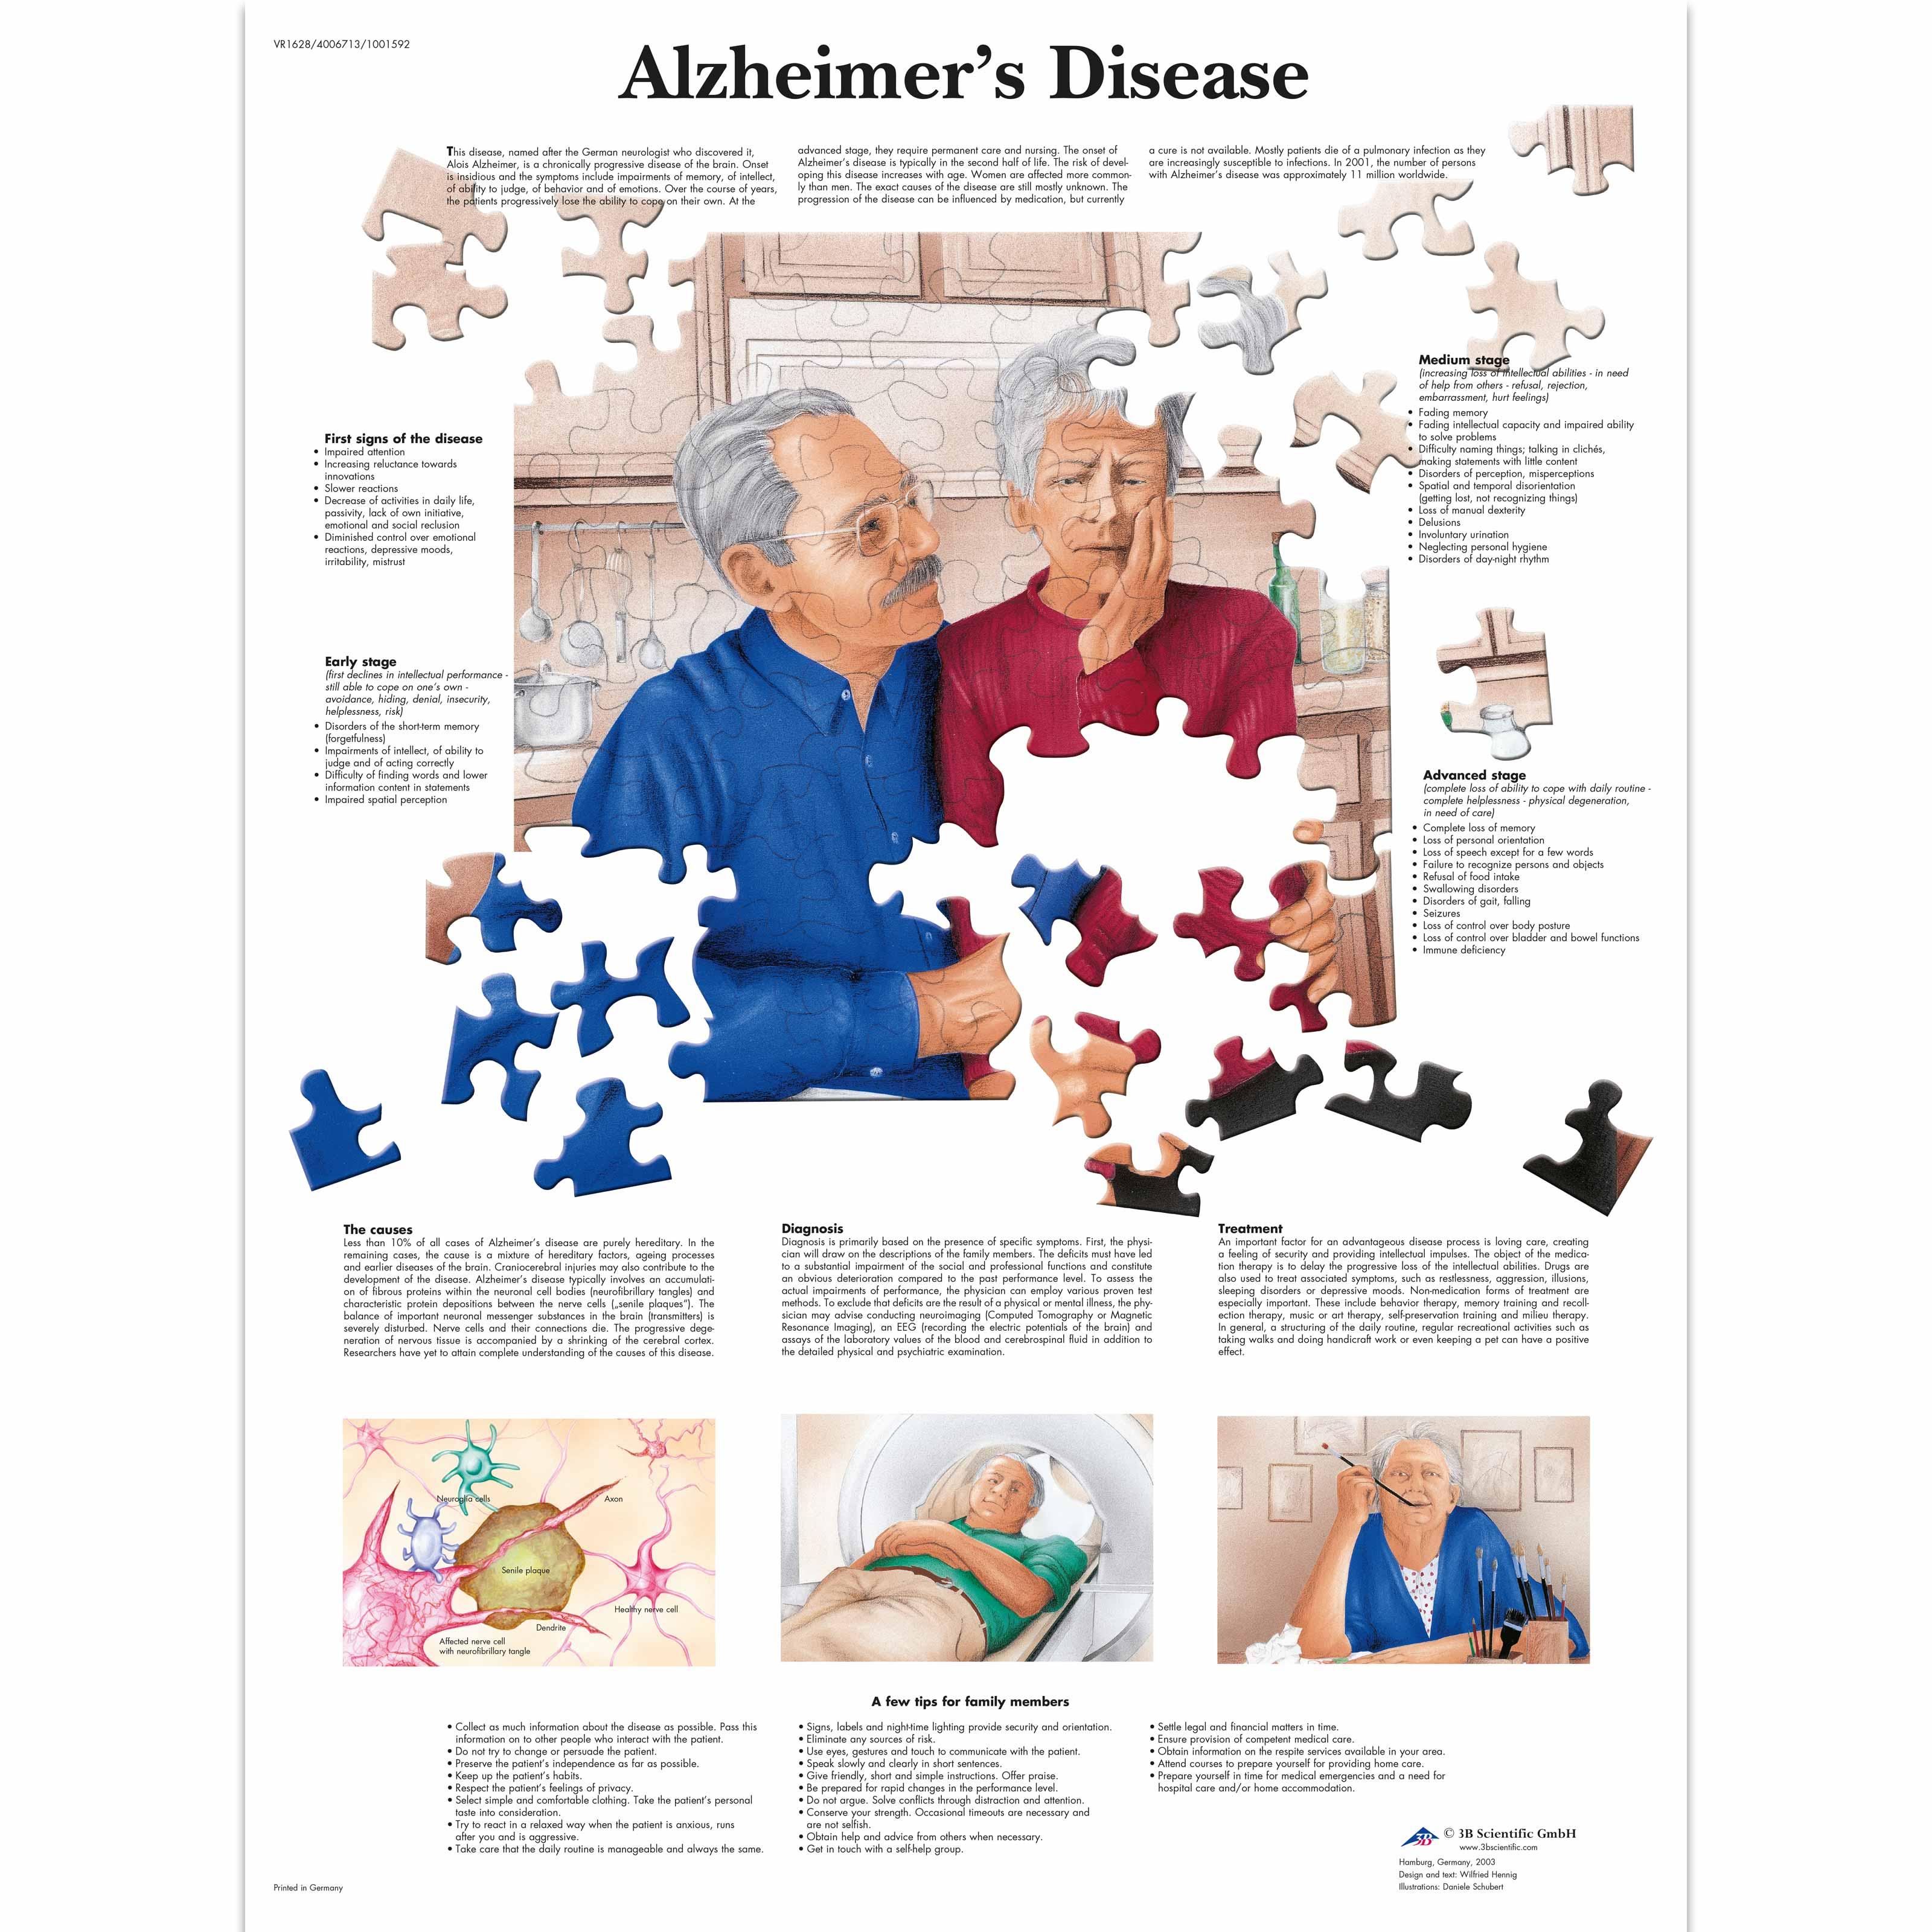 a description of alzheimers disease